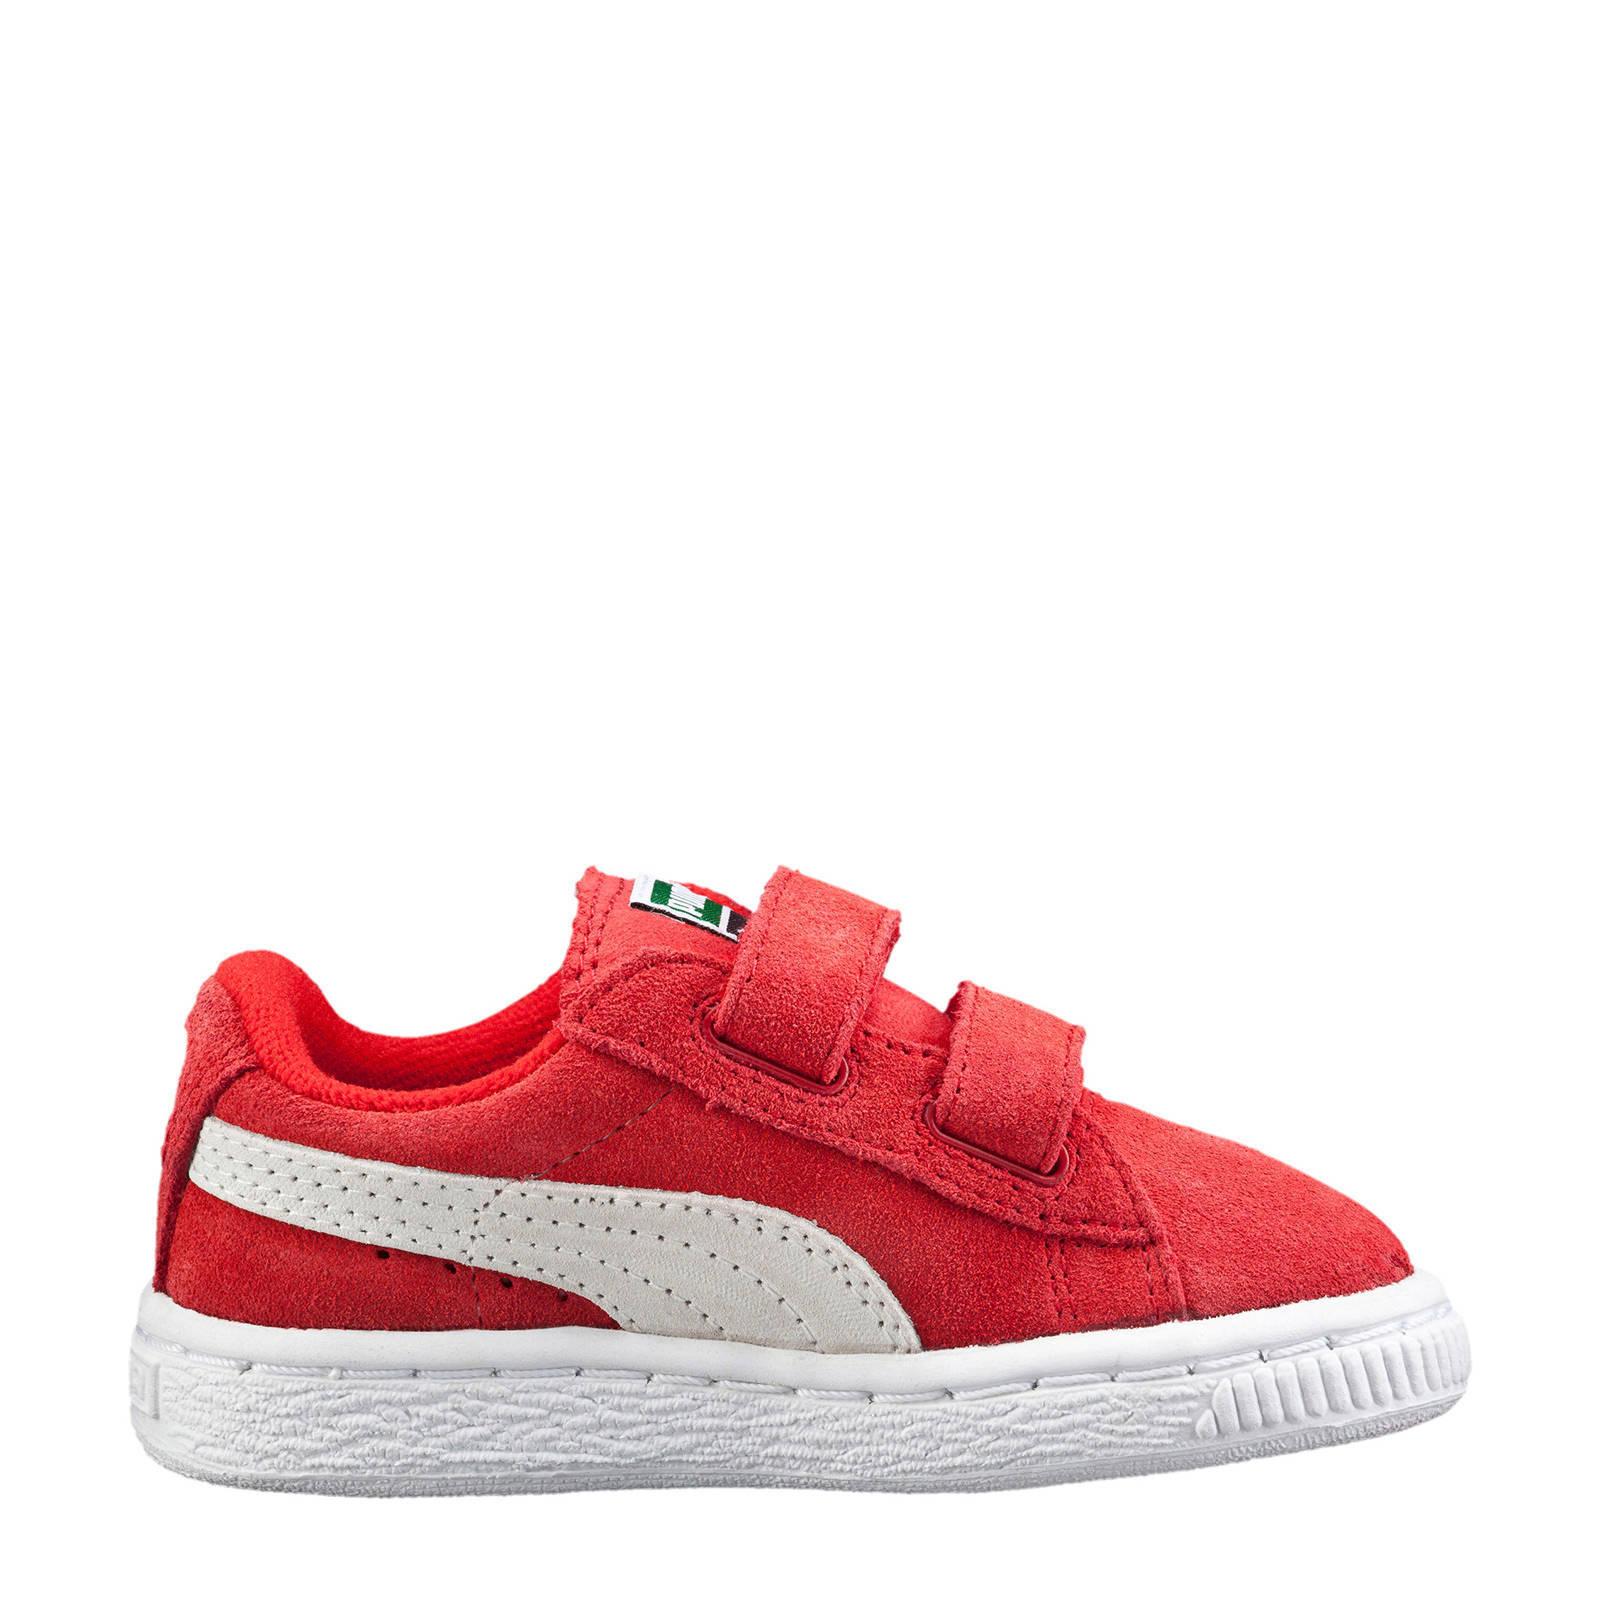 Puma Suède 2 Straps Infant sneakers rood   wehkamp